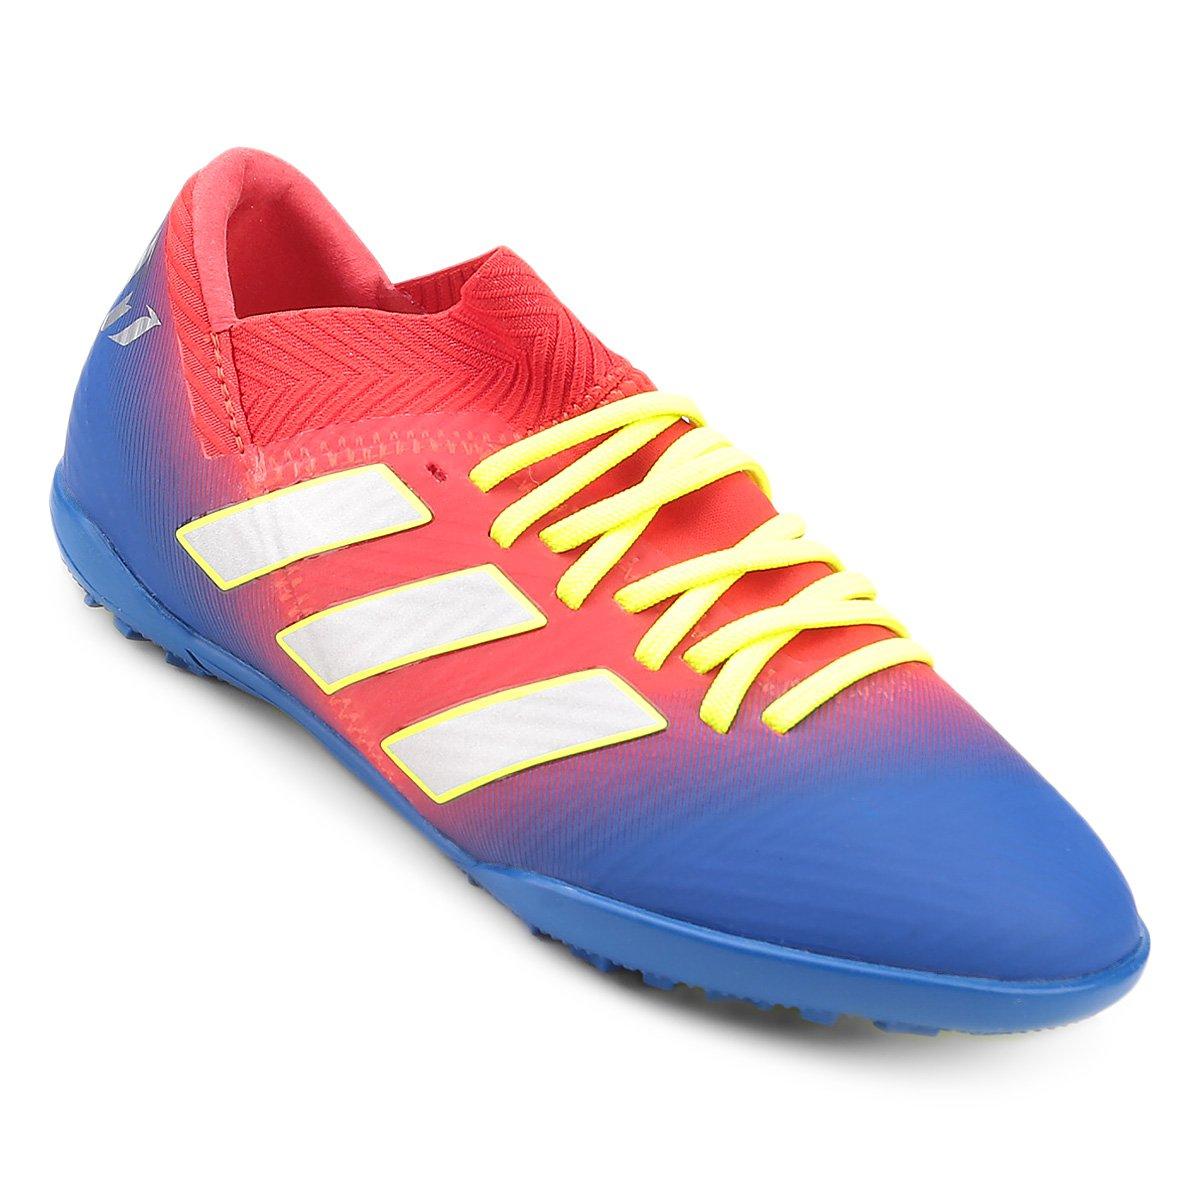 FornecedorNetshoes. Chuteira Society Infantil Adidas Nemeziz Messi 18 3 TF 9a9947ca2c3d0